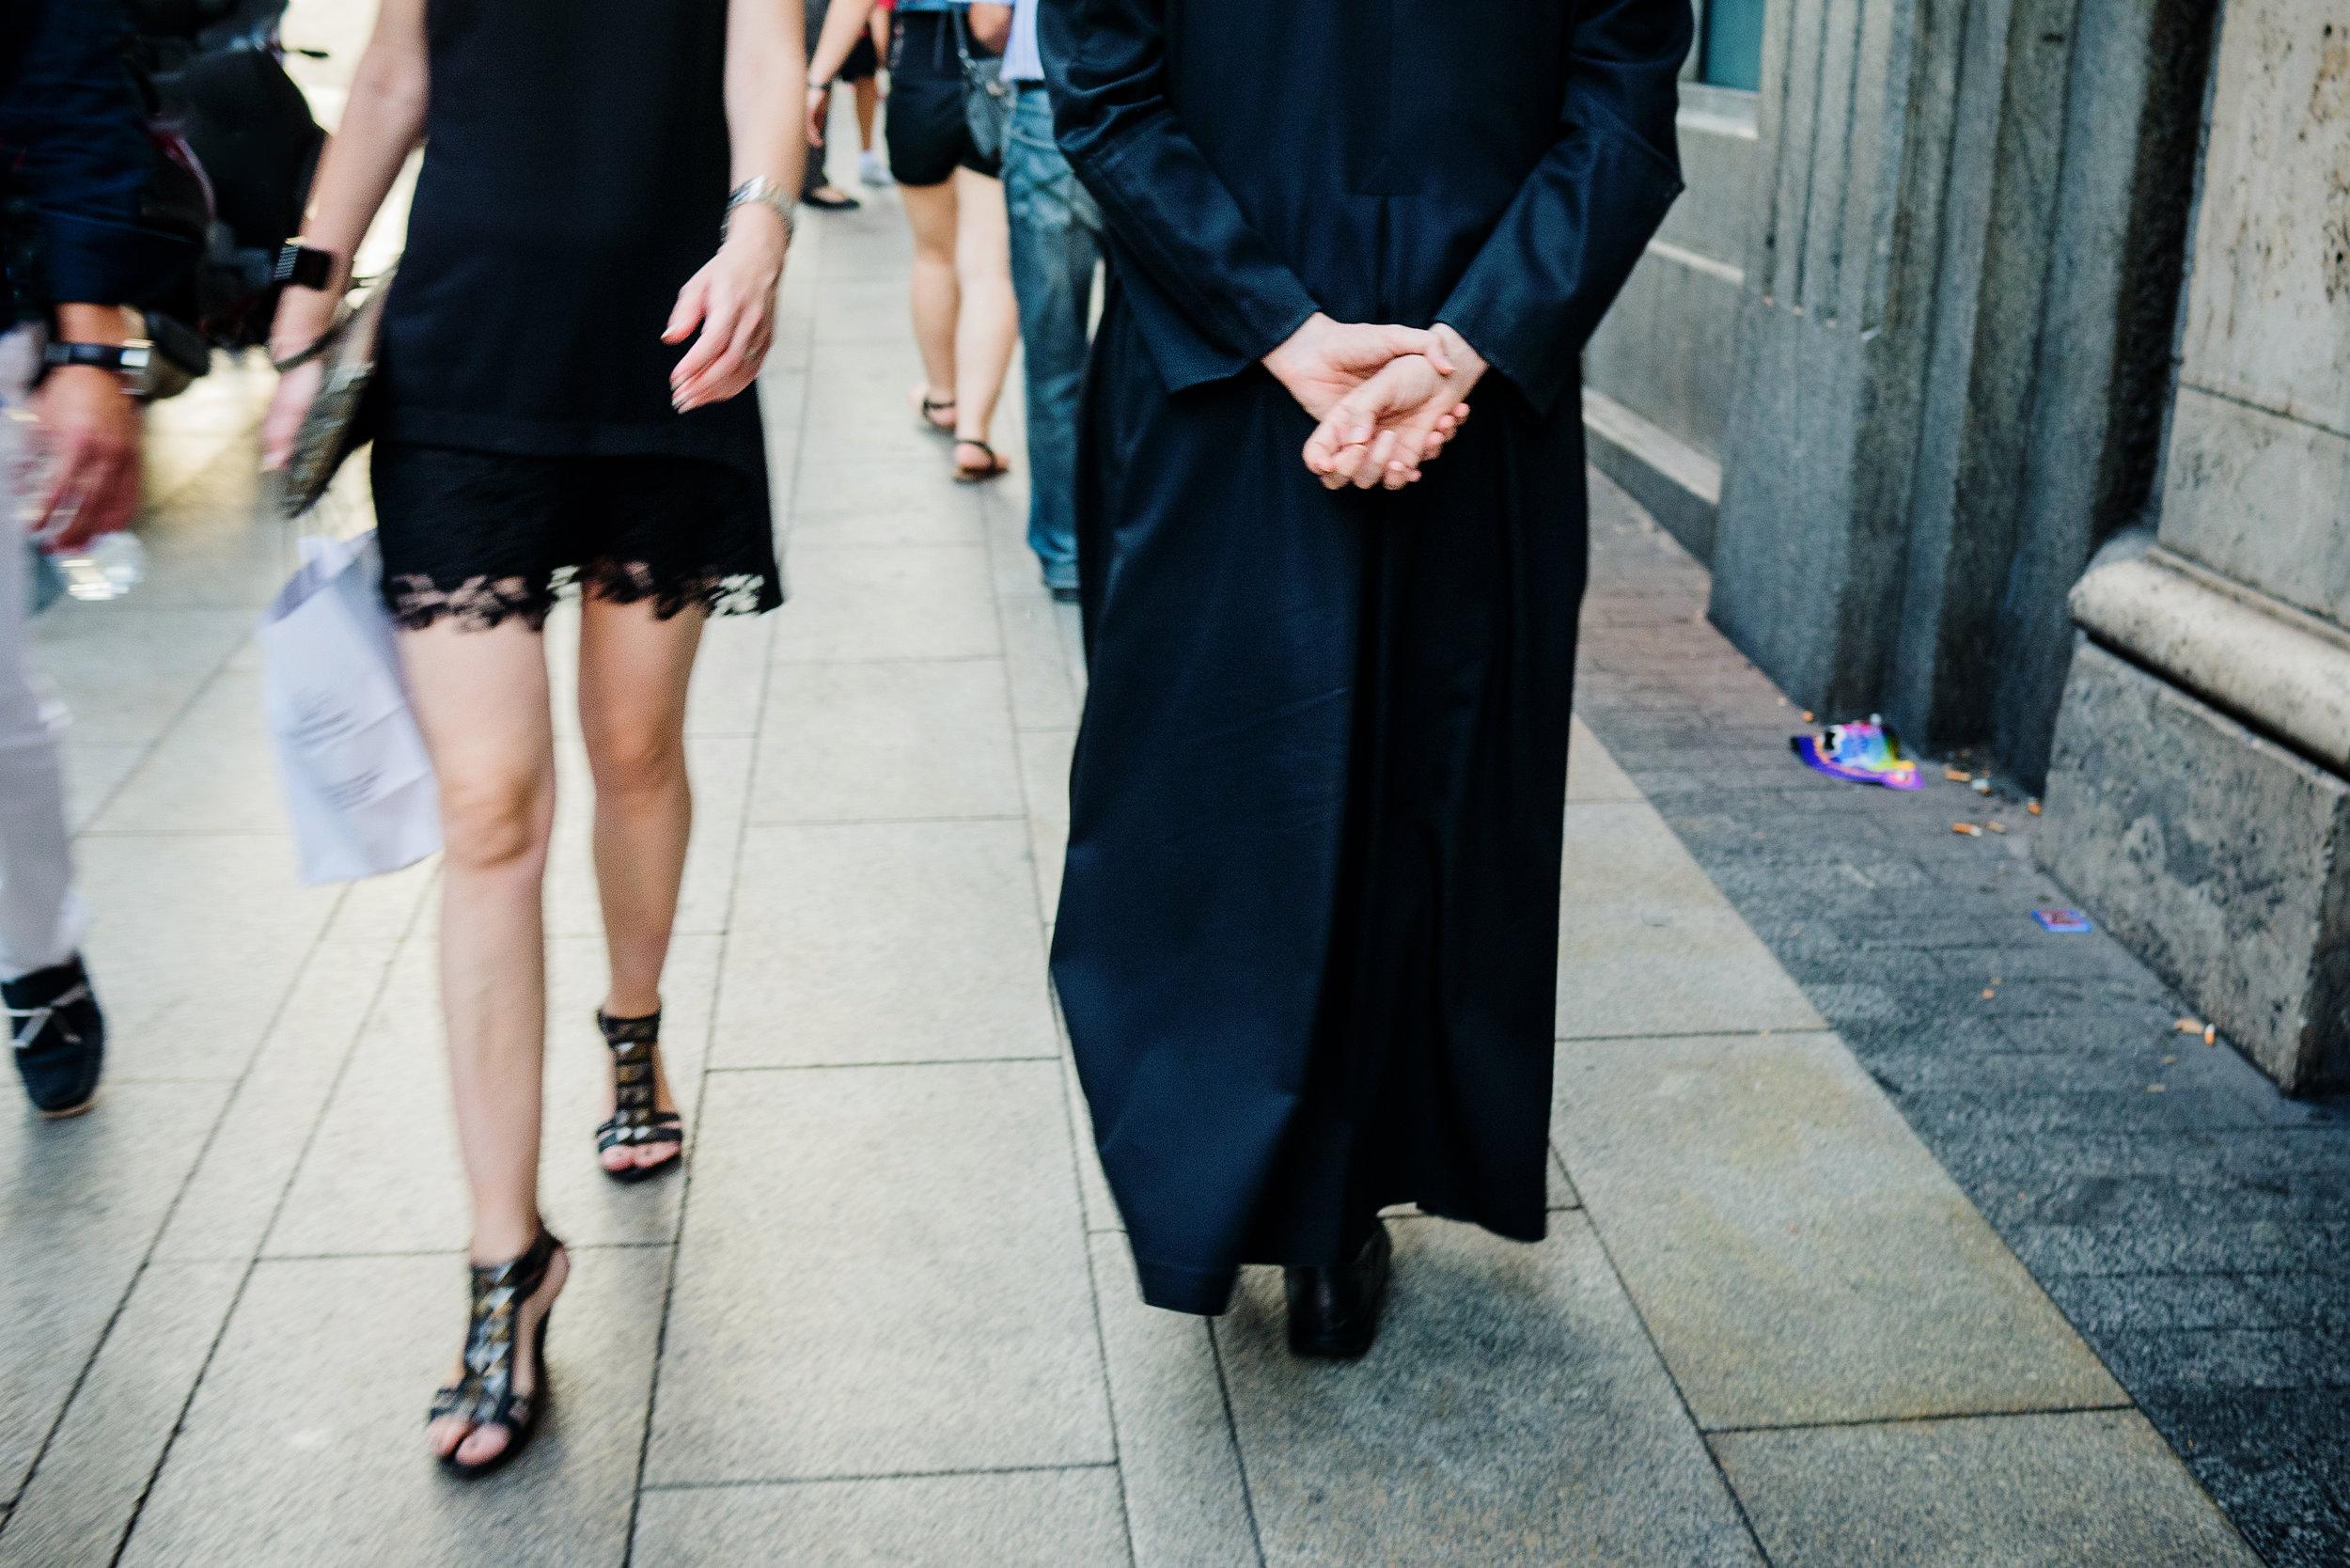 Mini skirt vs Priest